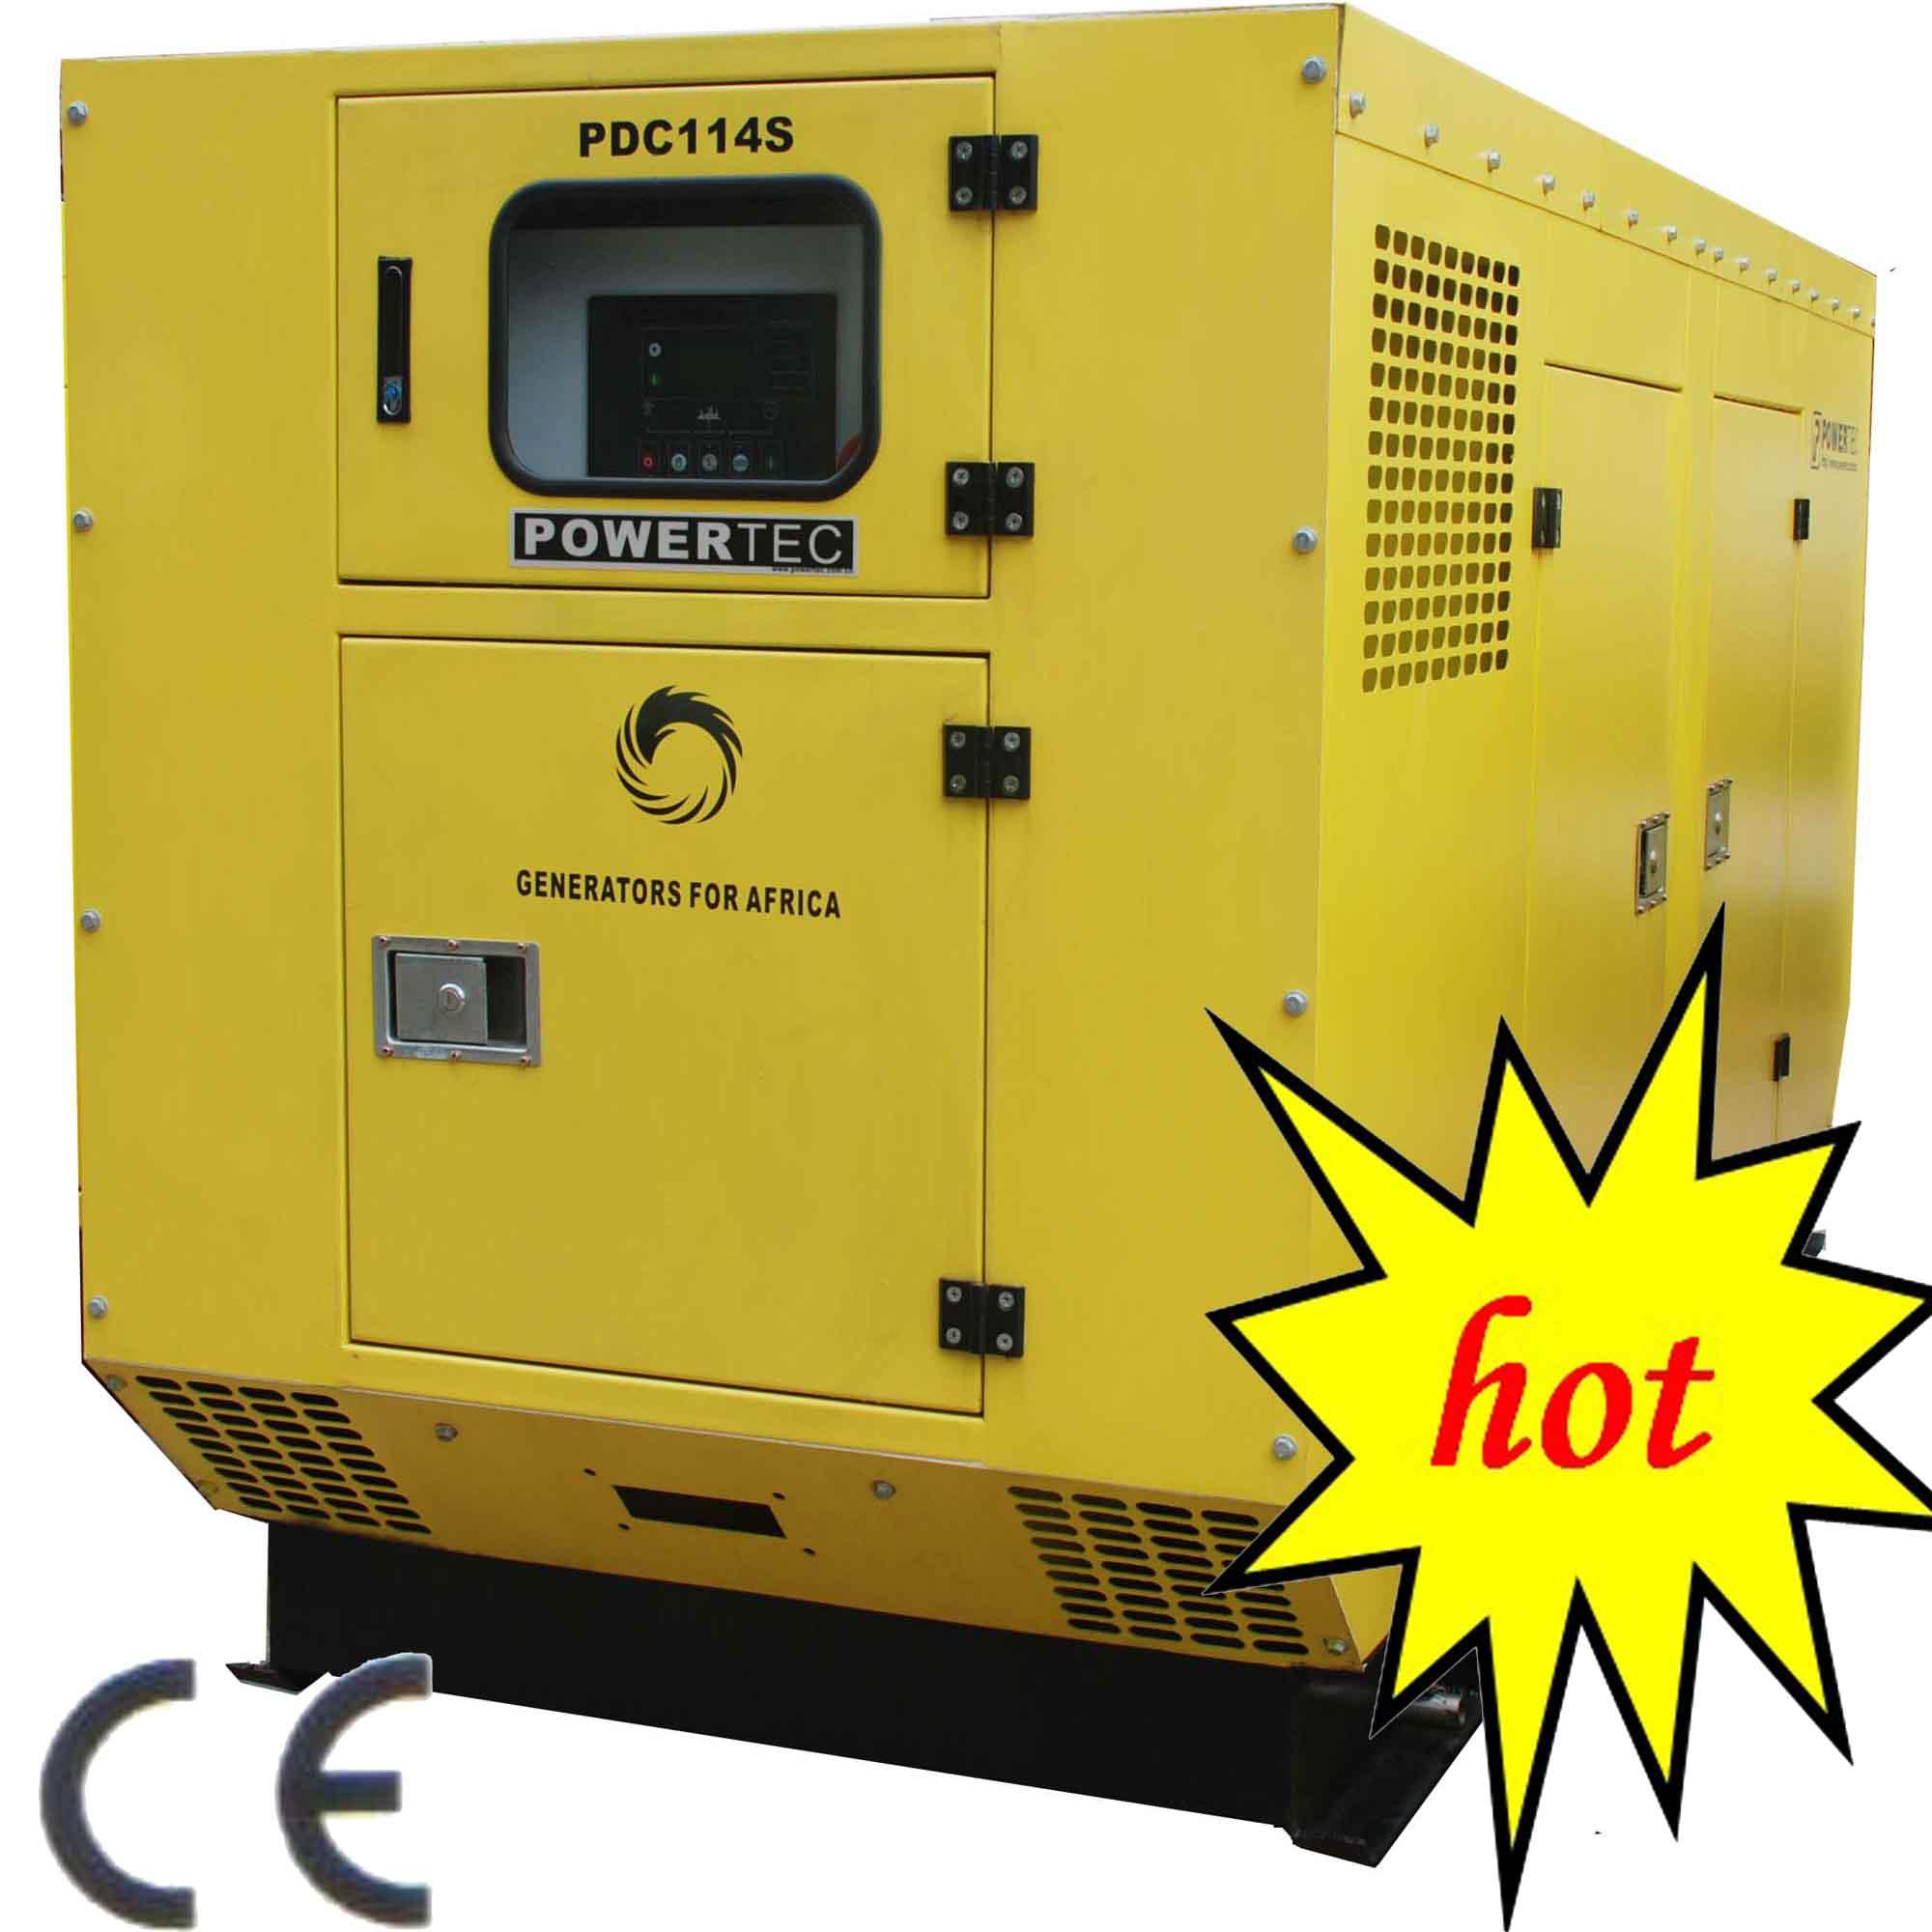 Generator 200kva Sound Proof Generator 200kva Sound Proof